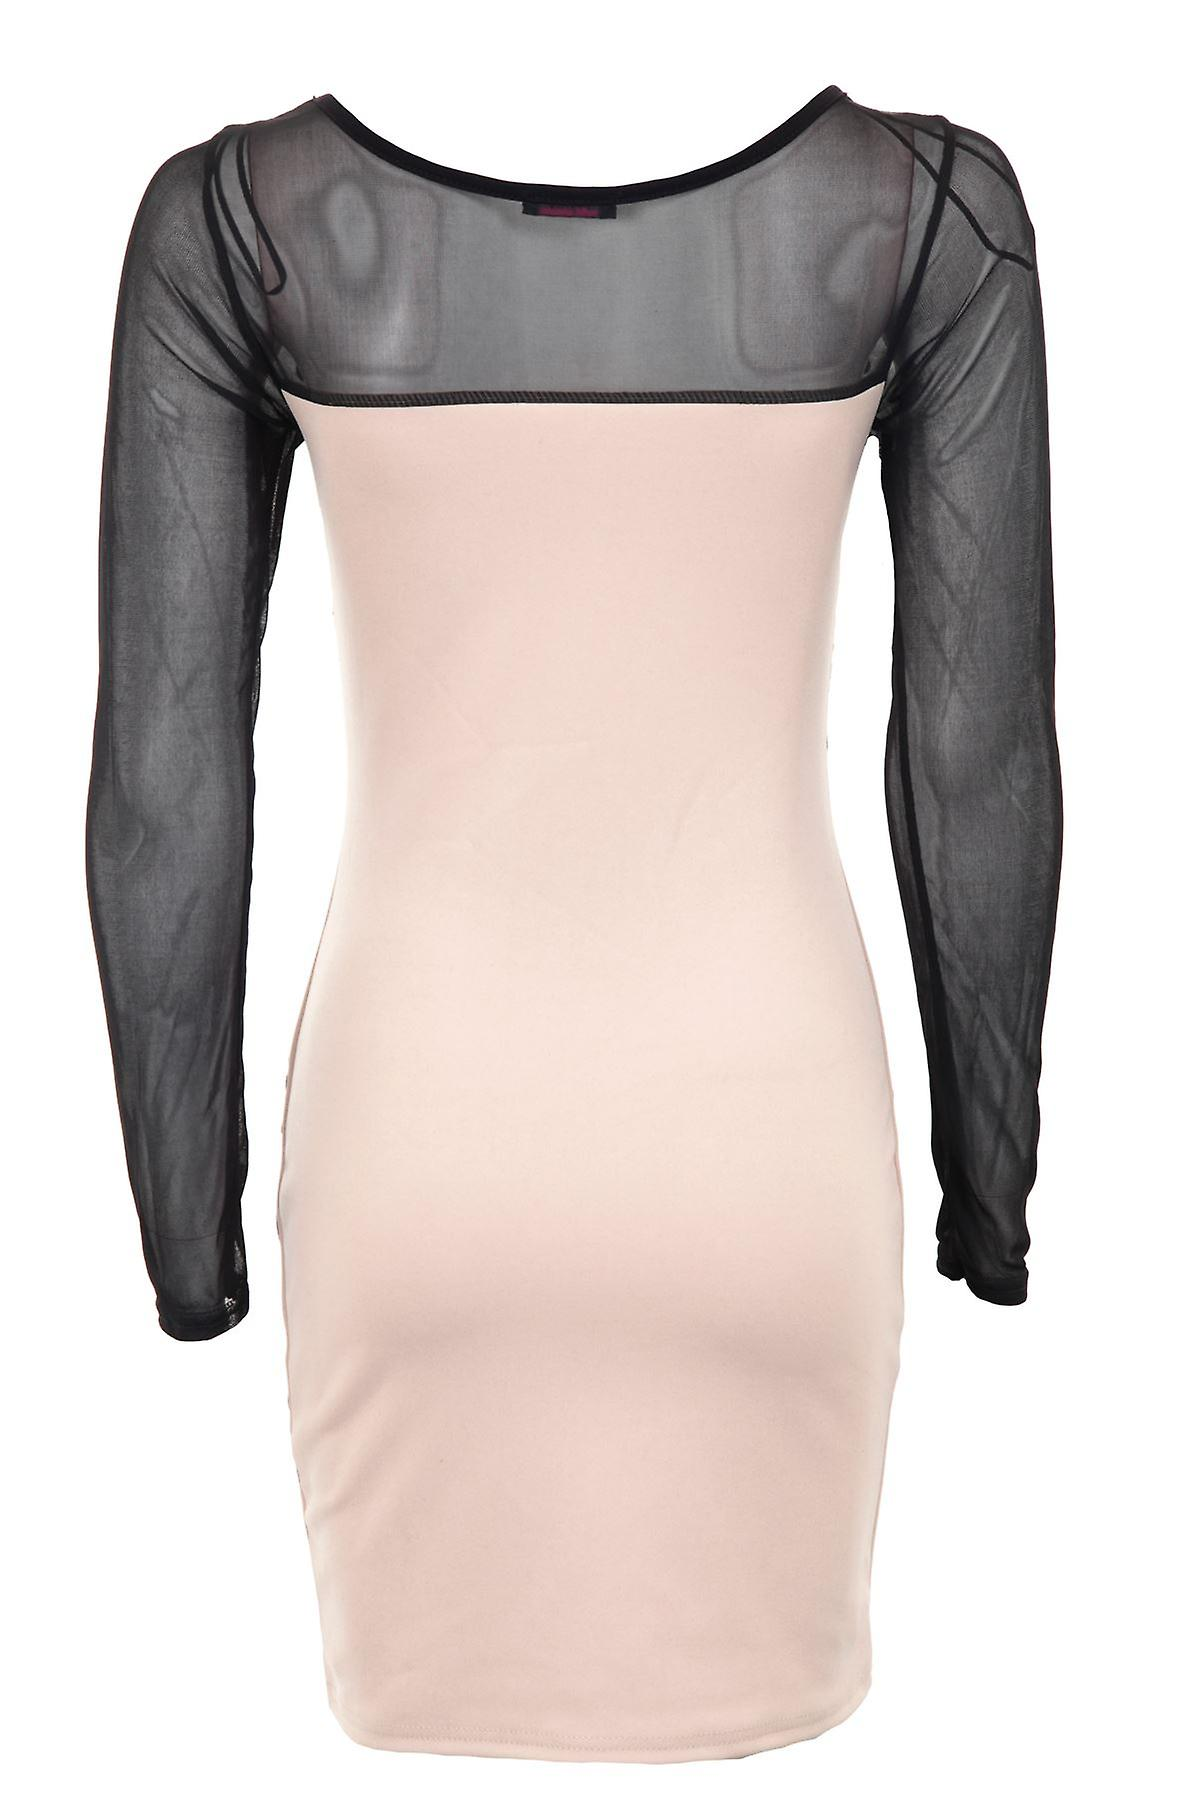 Ladies Long Sleve Mesh Slimming effect Black Brocade Design Bodycon Women Dress